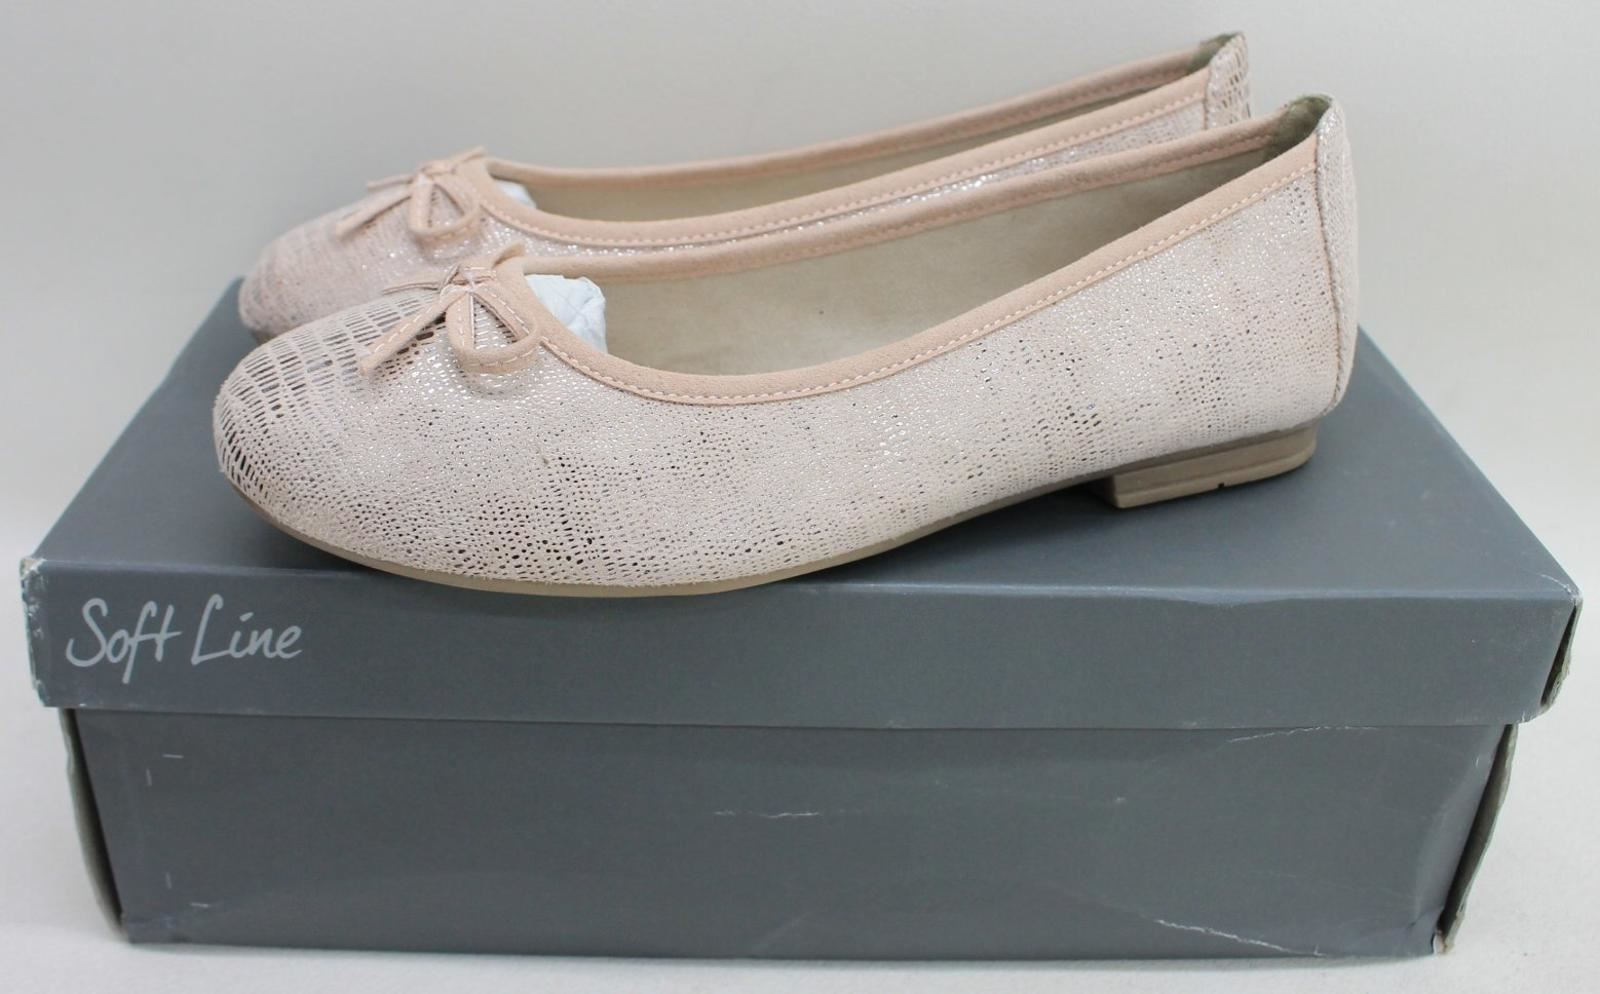 JANA Soft Line Ladies Rose Pink Carla Ballerina Flats Shoes UK3.5 EU36 NEW